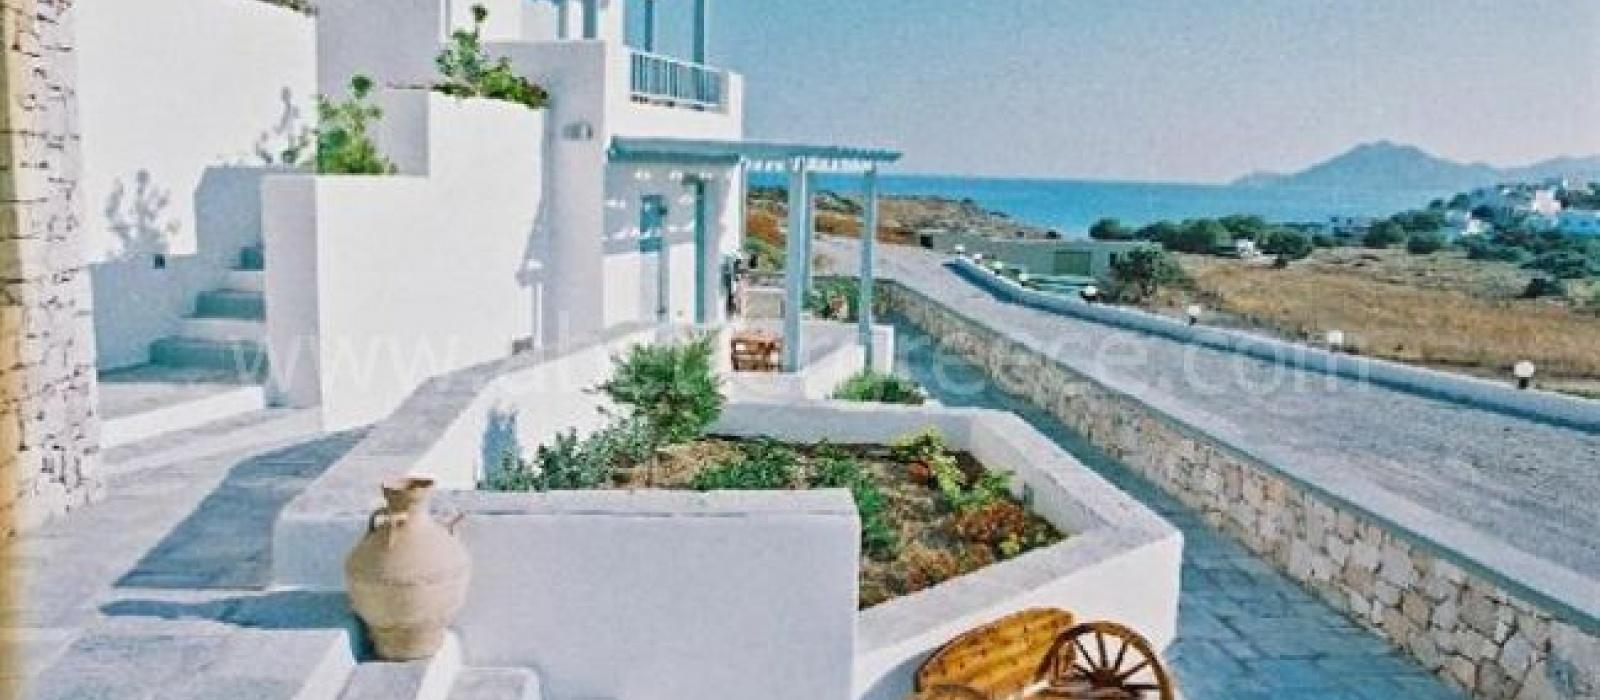 1 Bedrooms, Apartment, Vacation Rental, 1 Bathrooms, Listing ID 1219, Milos, Greece,